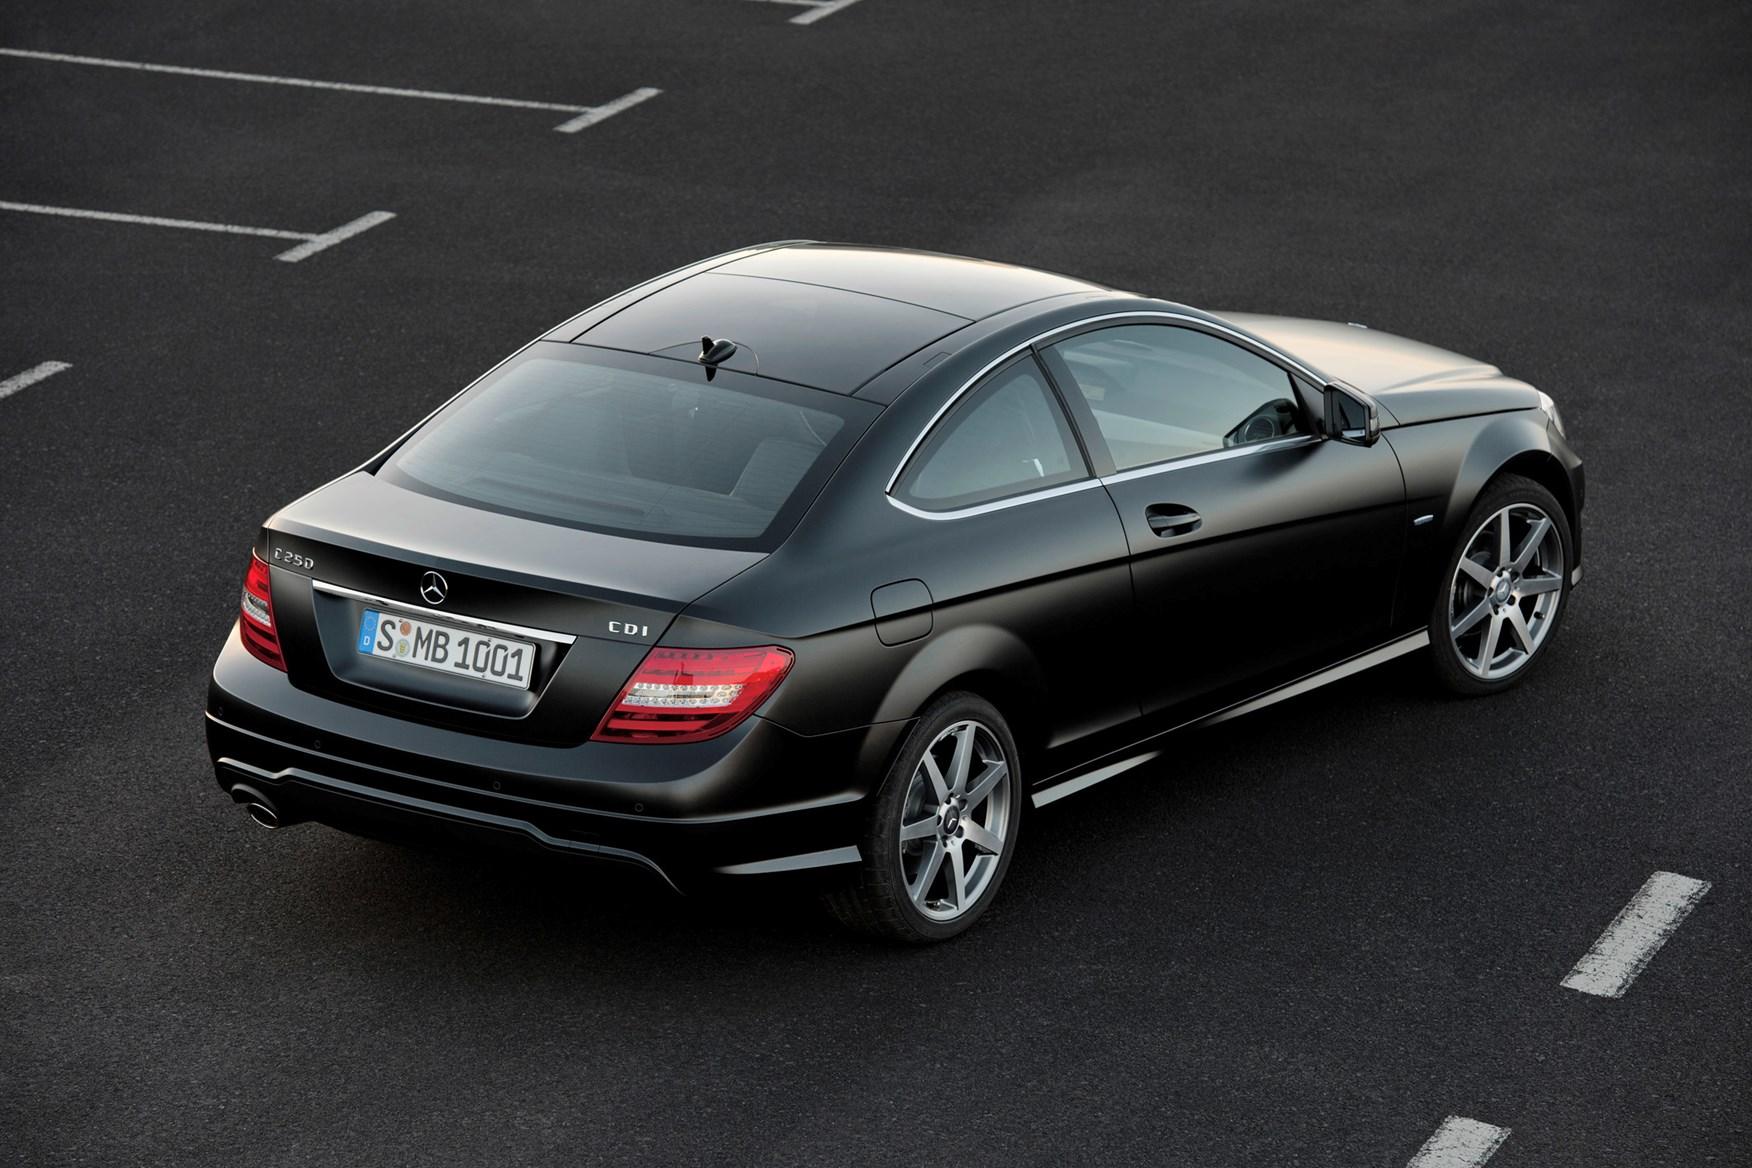 2013 mercedes benz c180 coupe specs